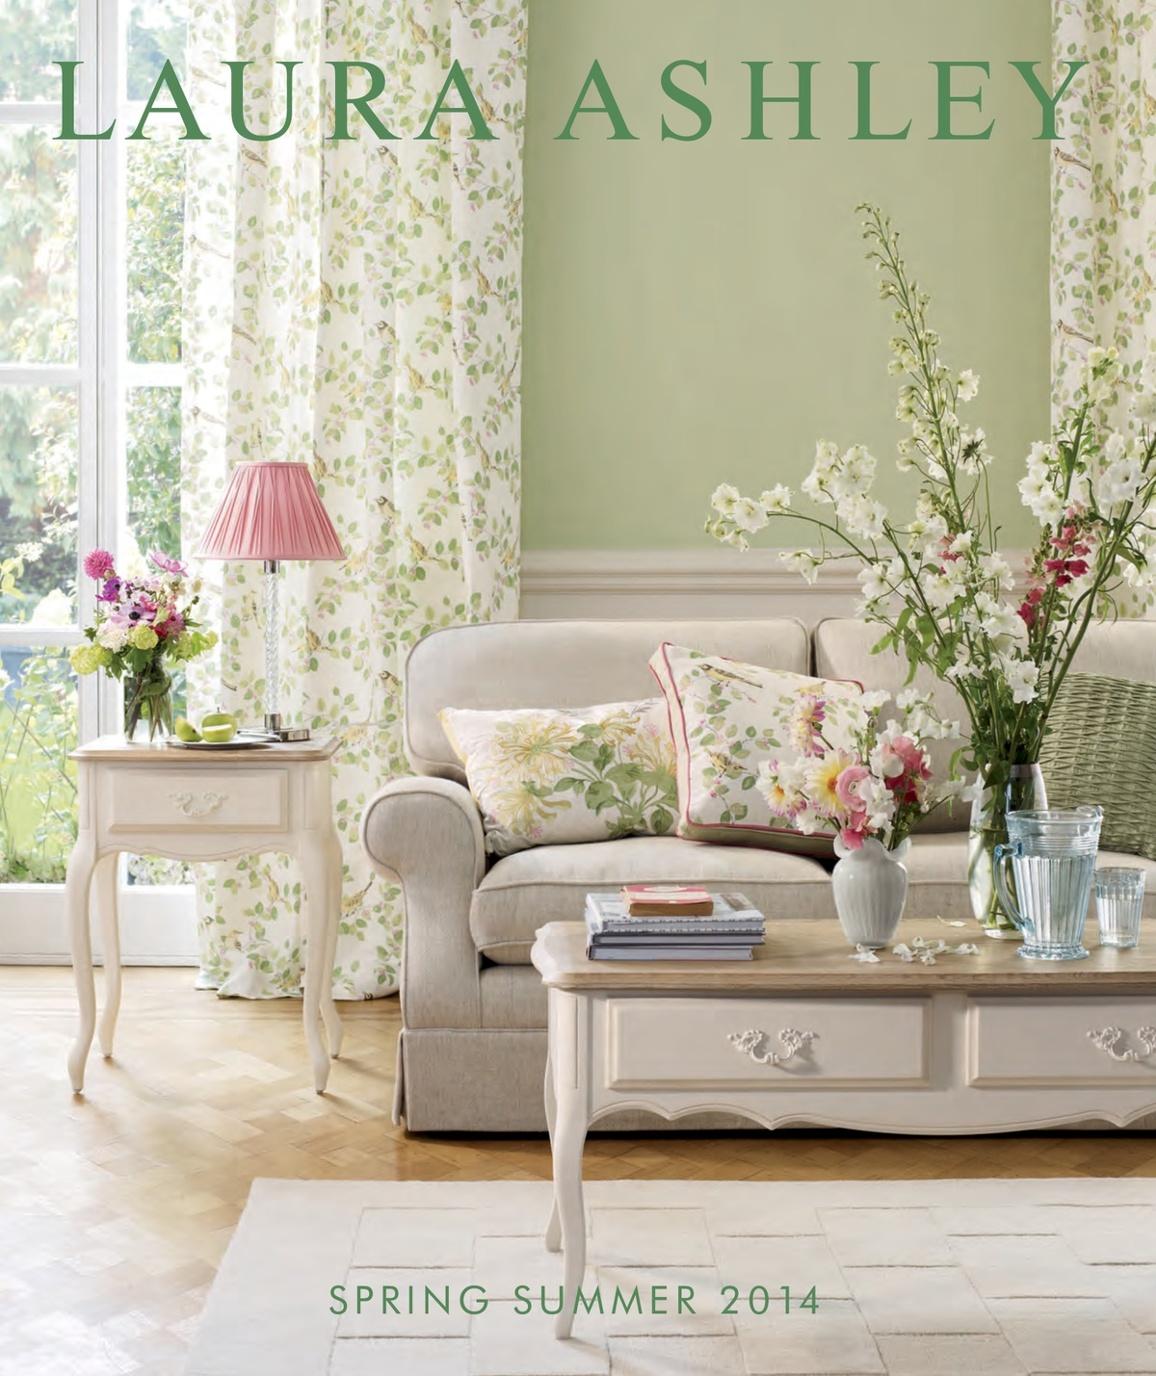 Laura Ashley Spring Summer 2014 Catalogue